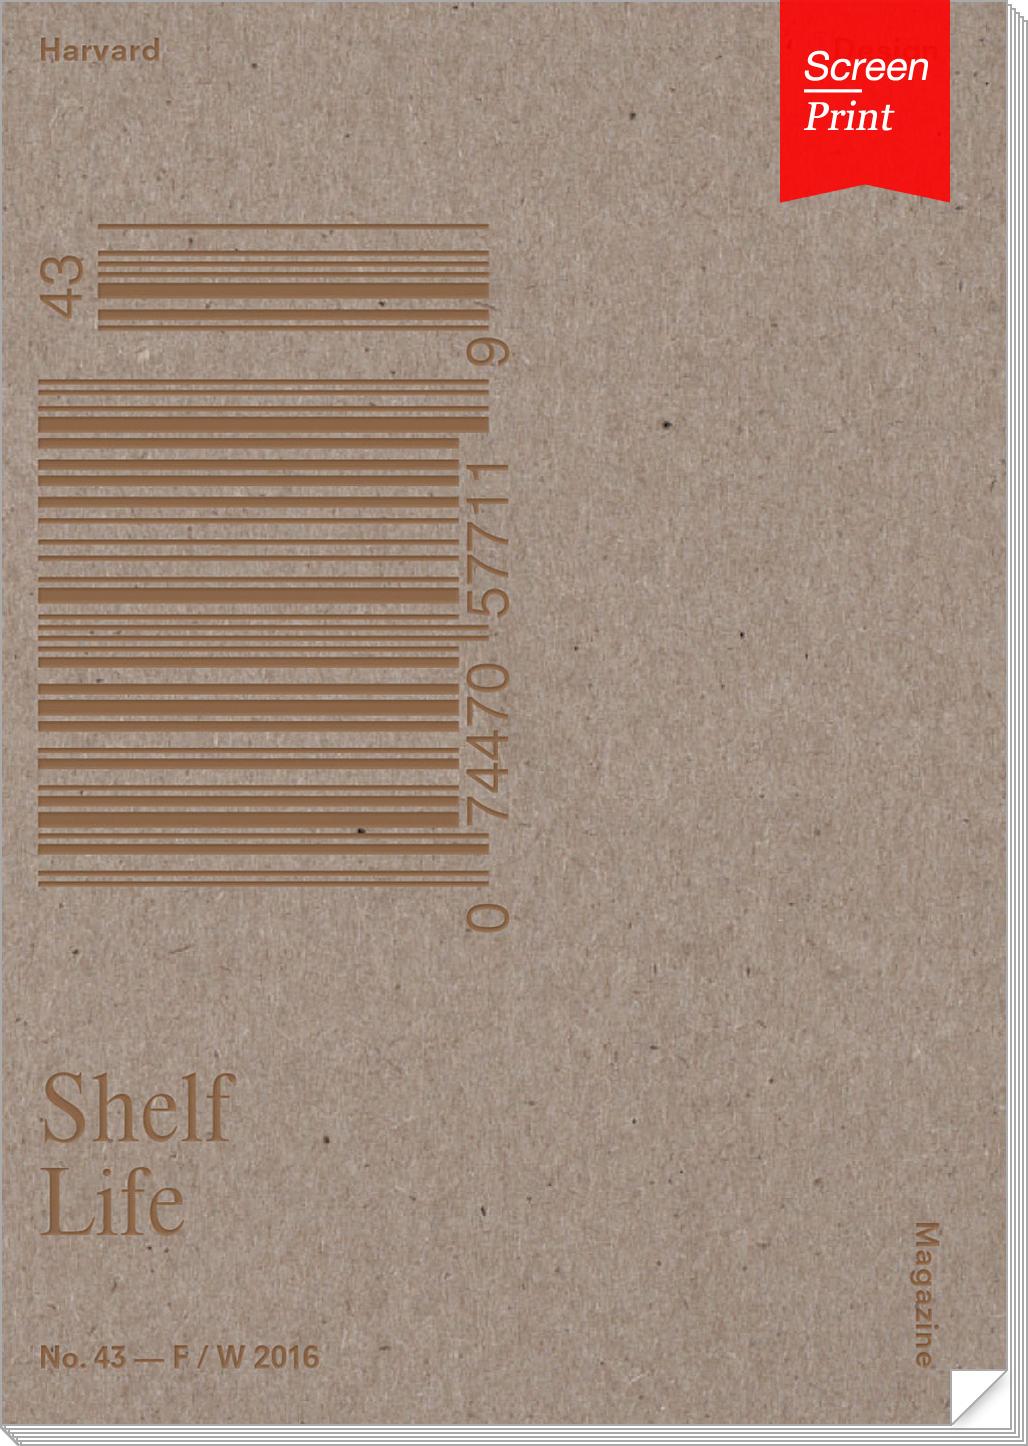 Harvard Design Magazines issue no. 43, Shelf Life.